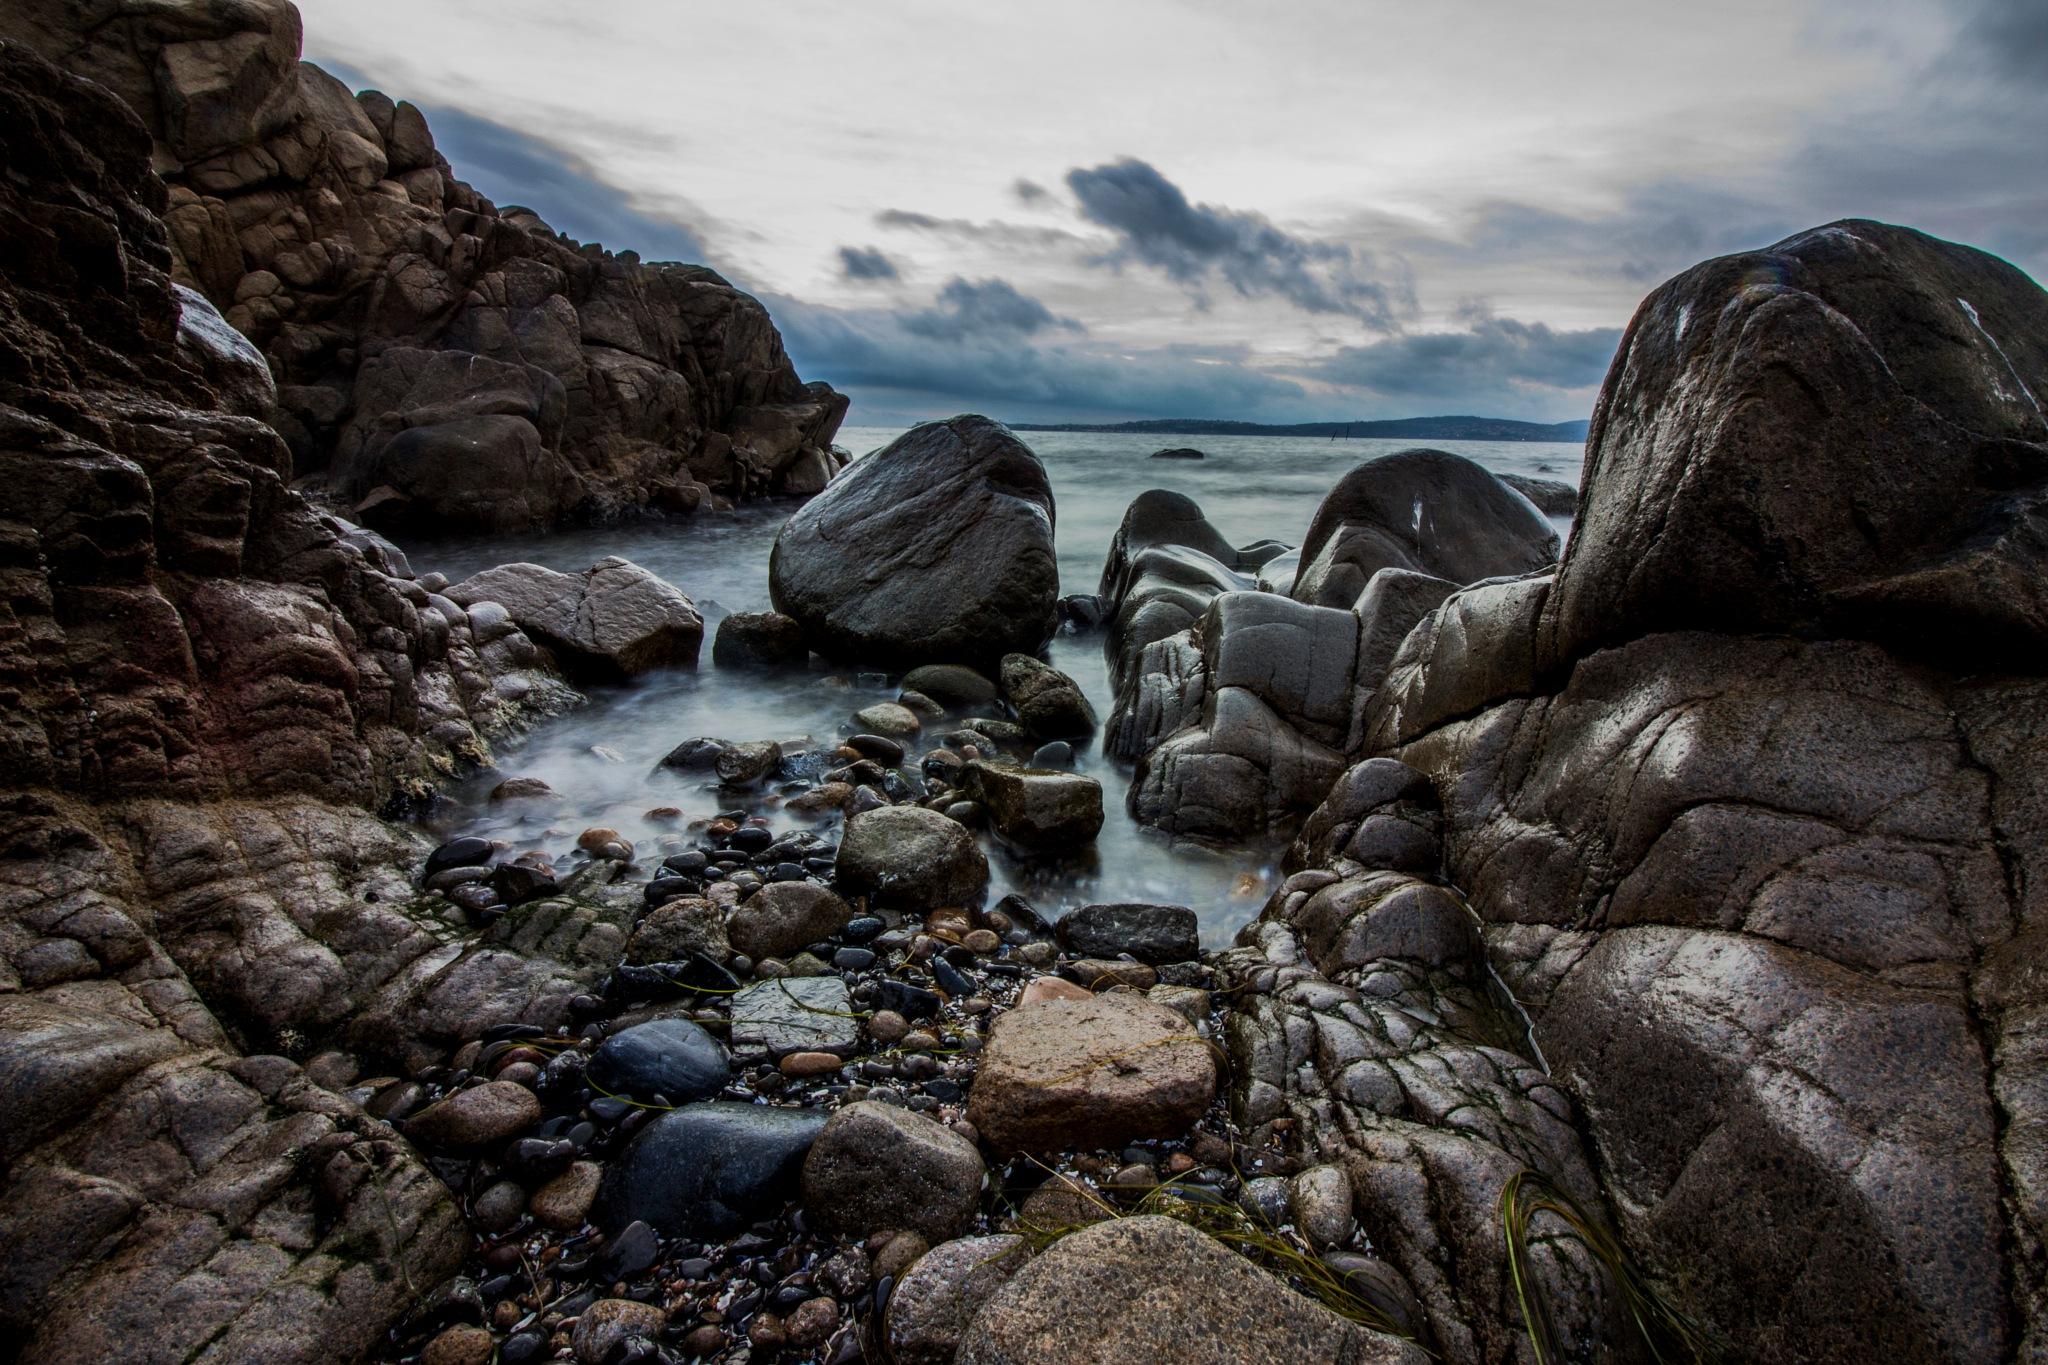 By The Sea by Ivan Agafonov